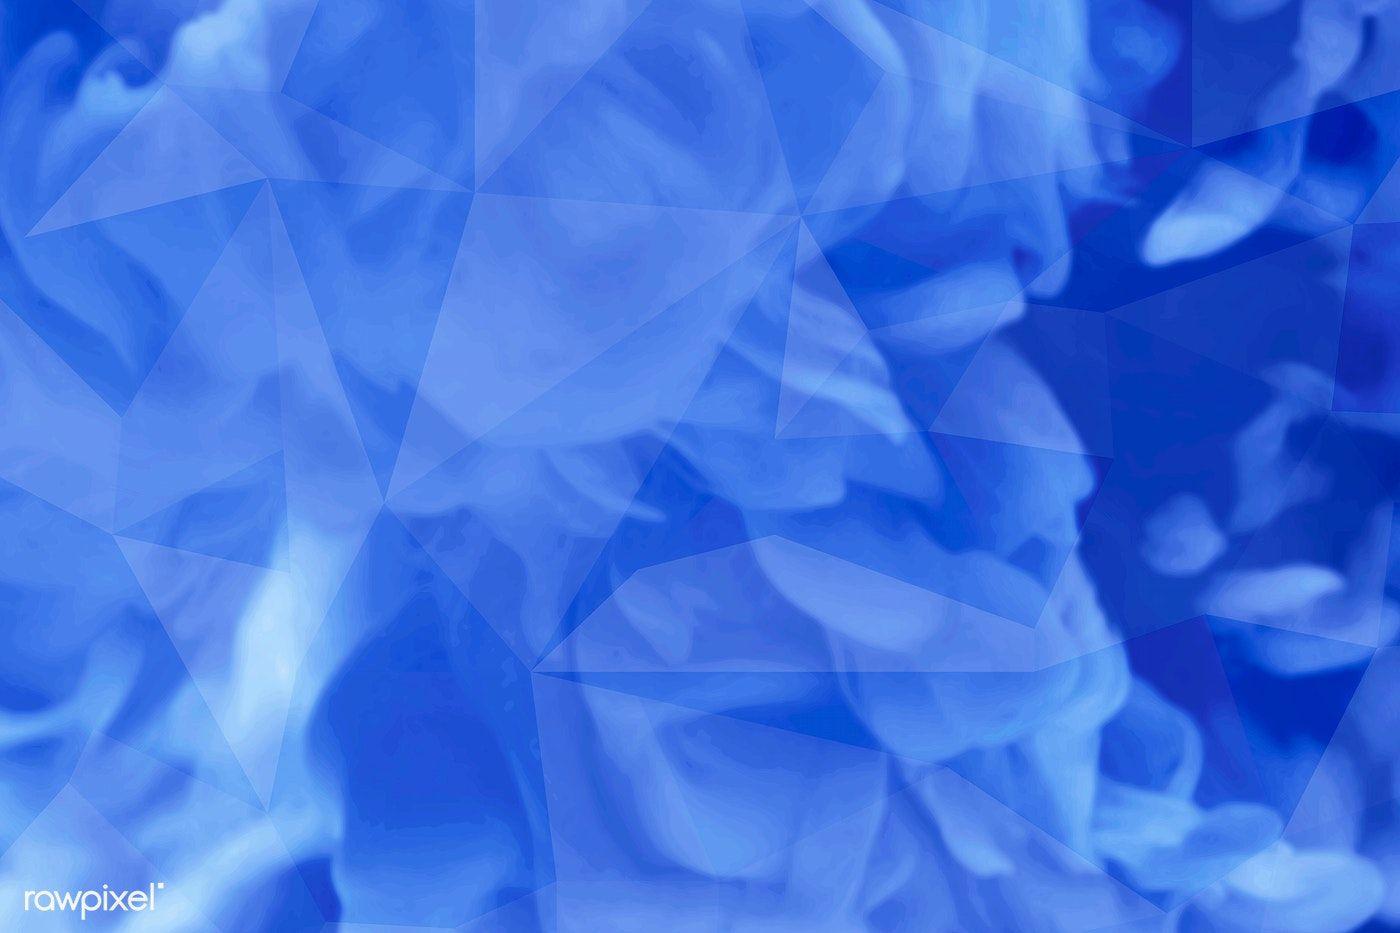 Download Premium Illustration Of Blue Fluid Patterned Background 2339333 Background Patterns Blue Background Images Free Illustrations